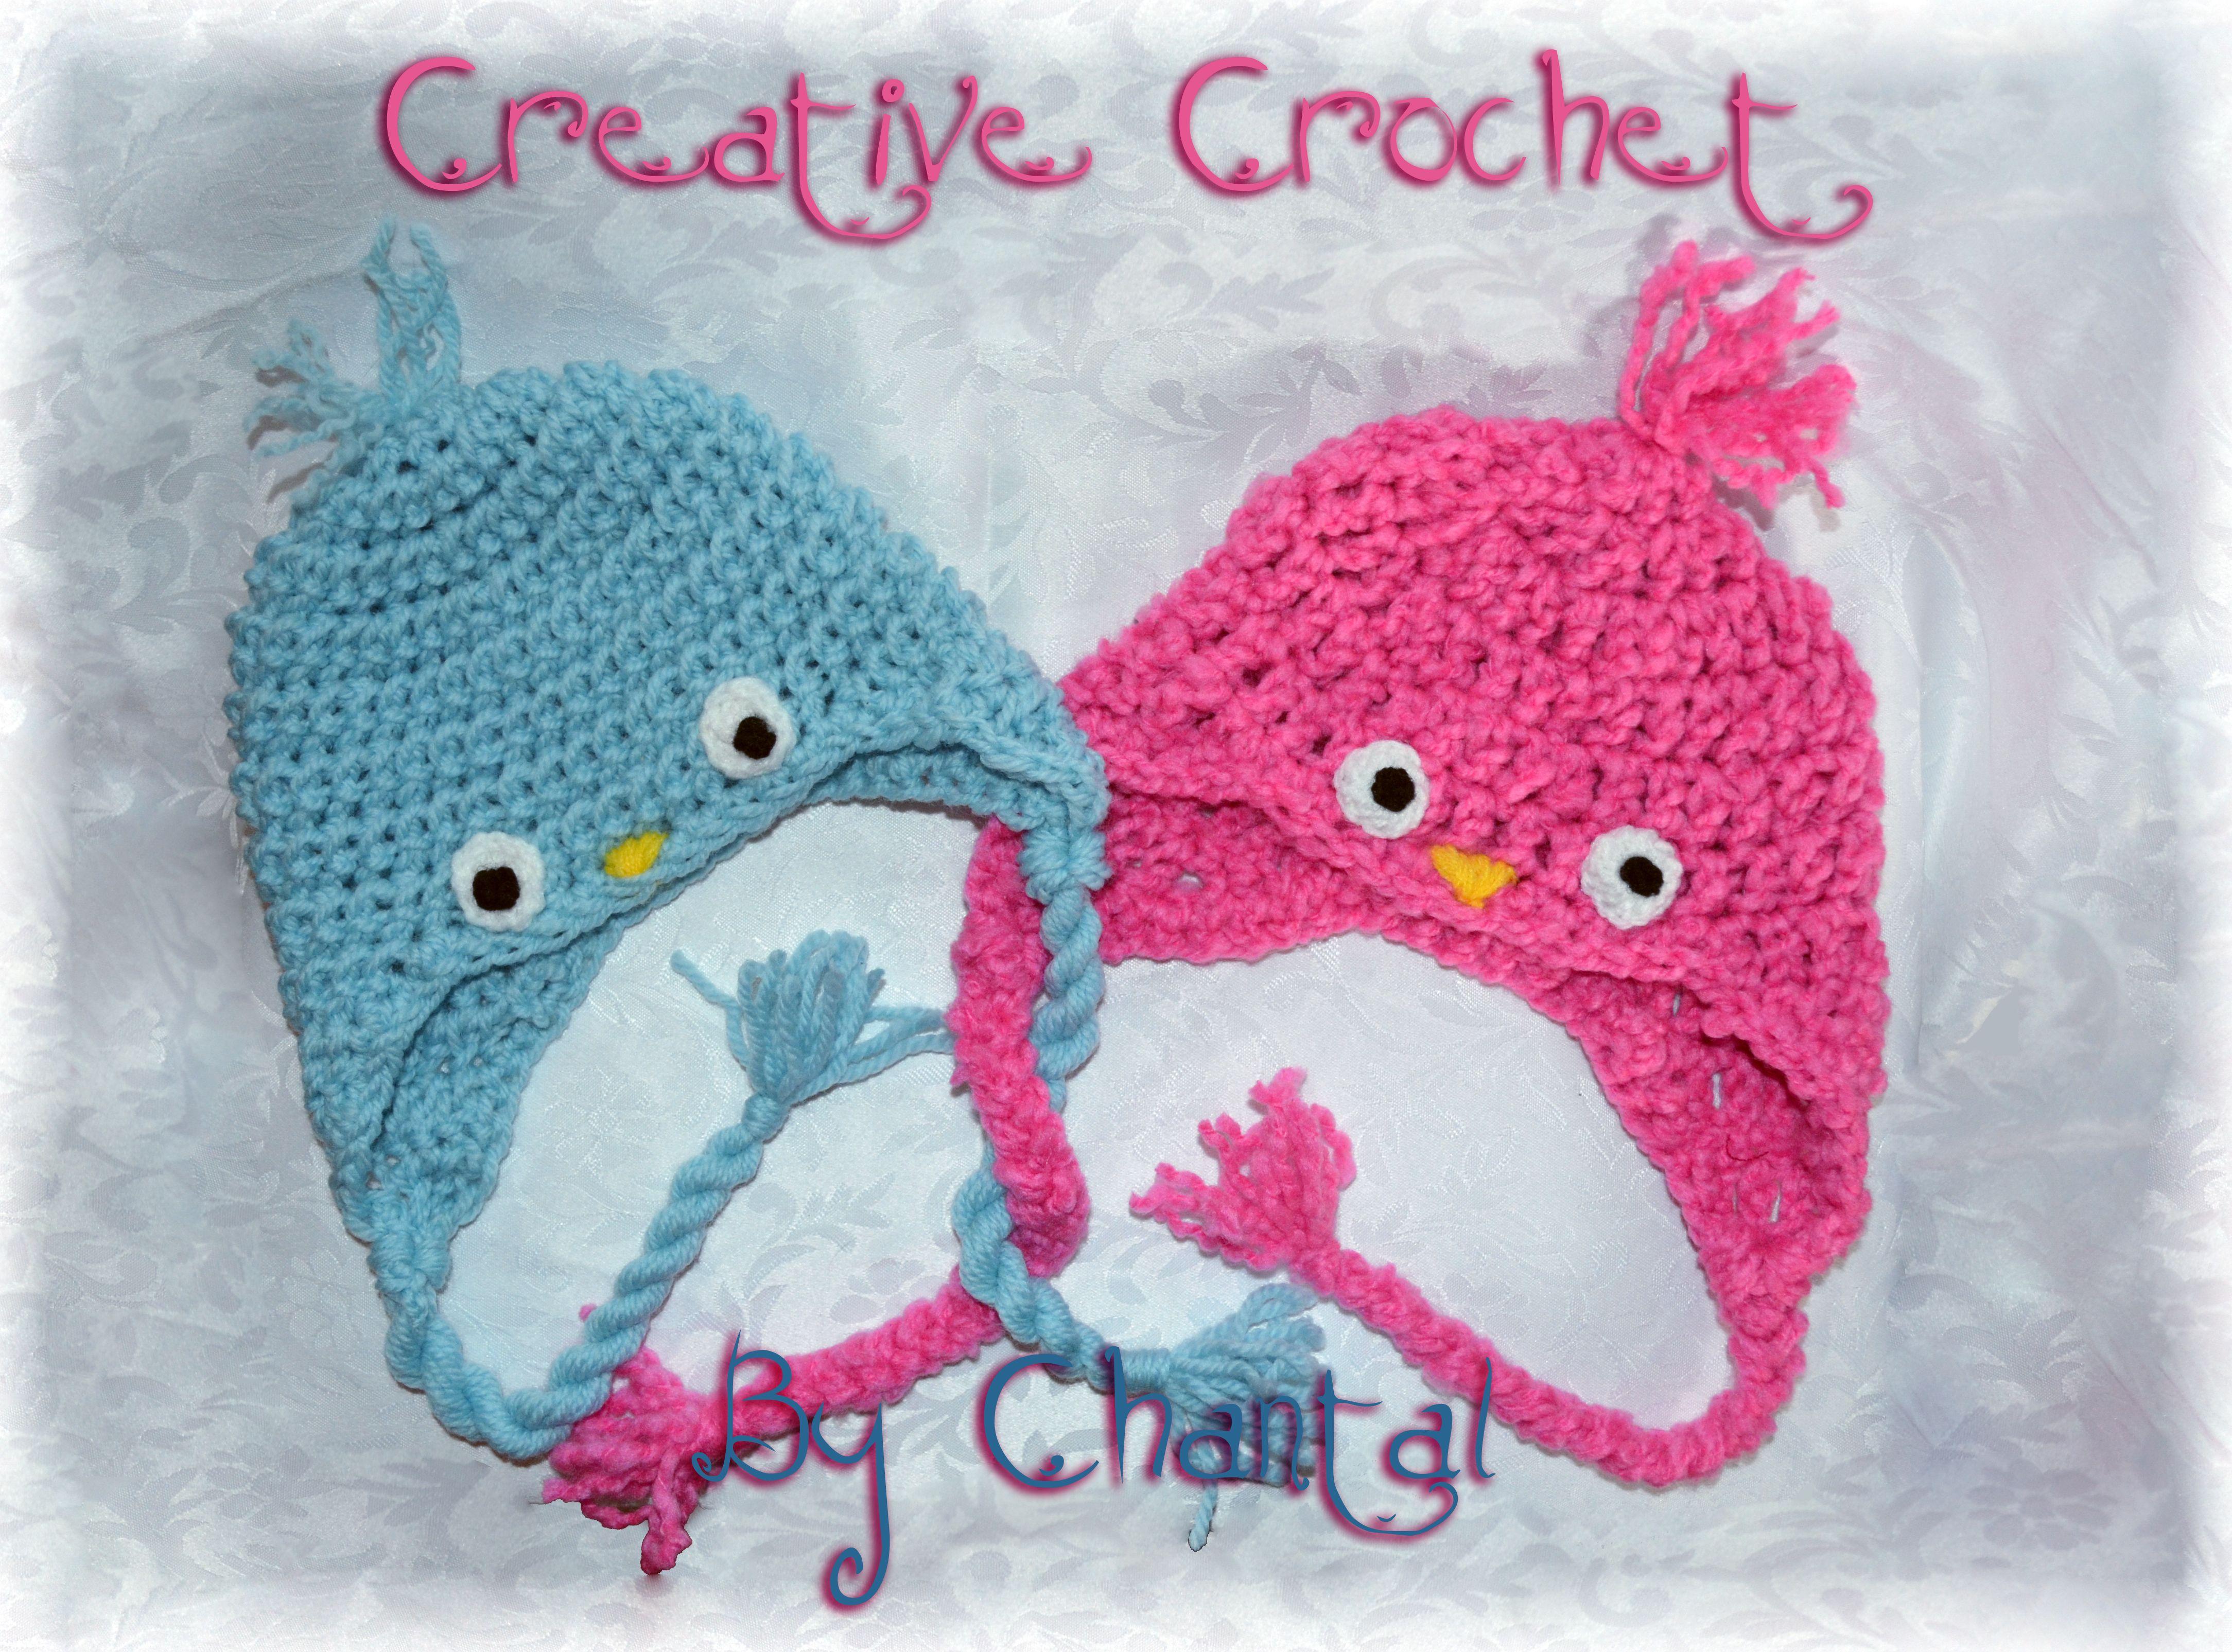 Birdy crocheted hats